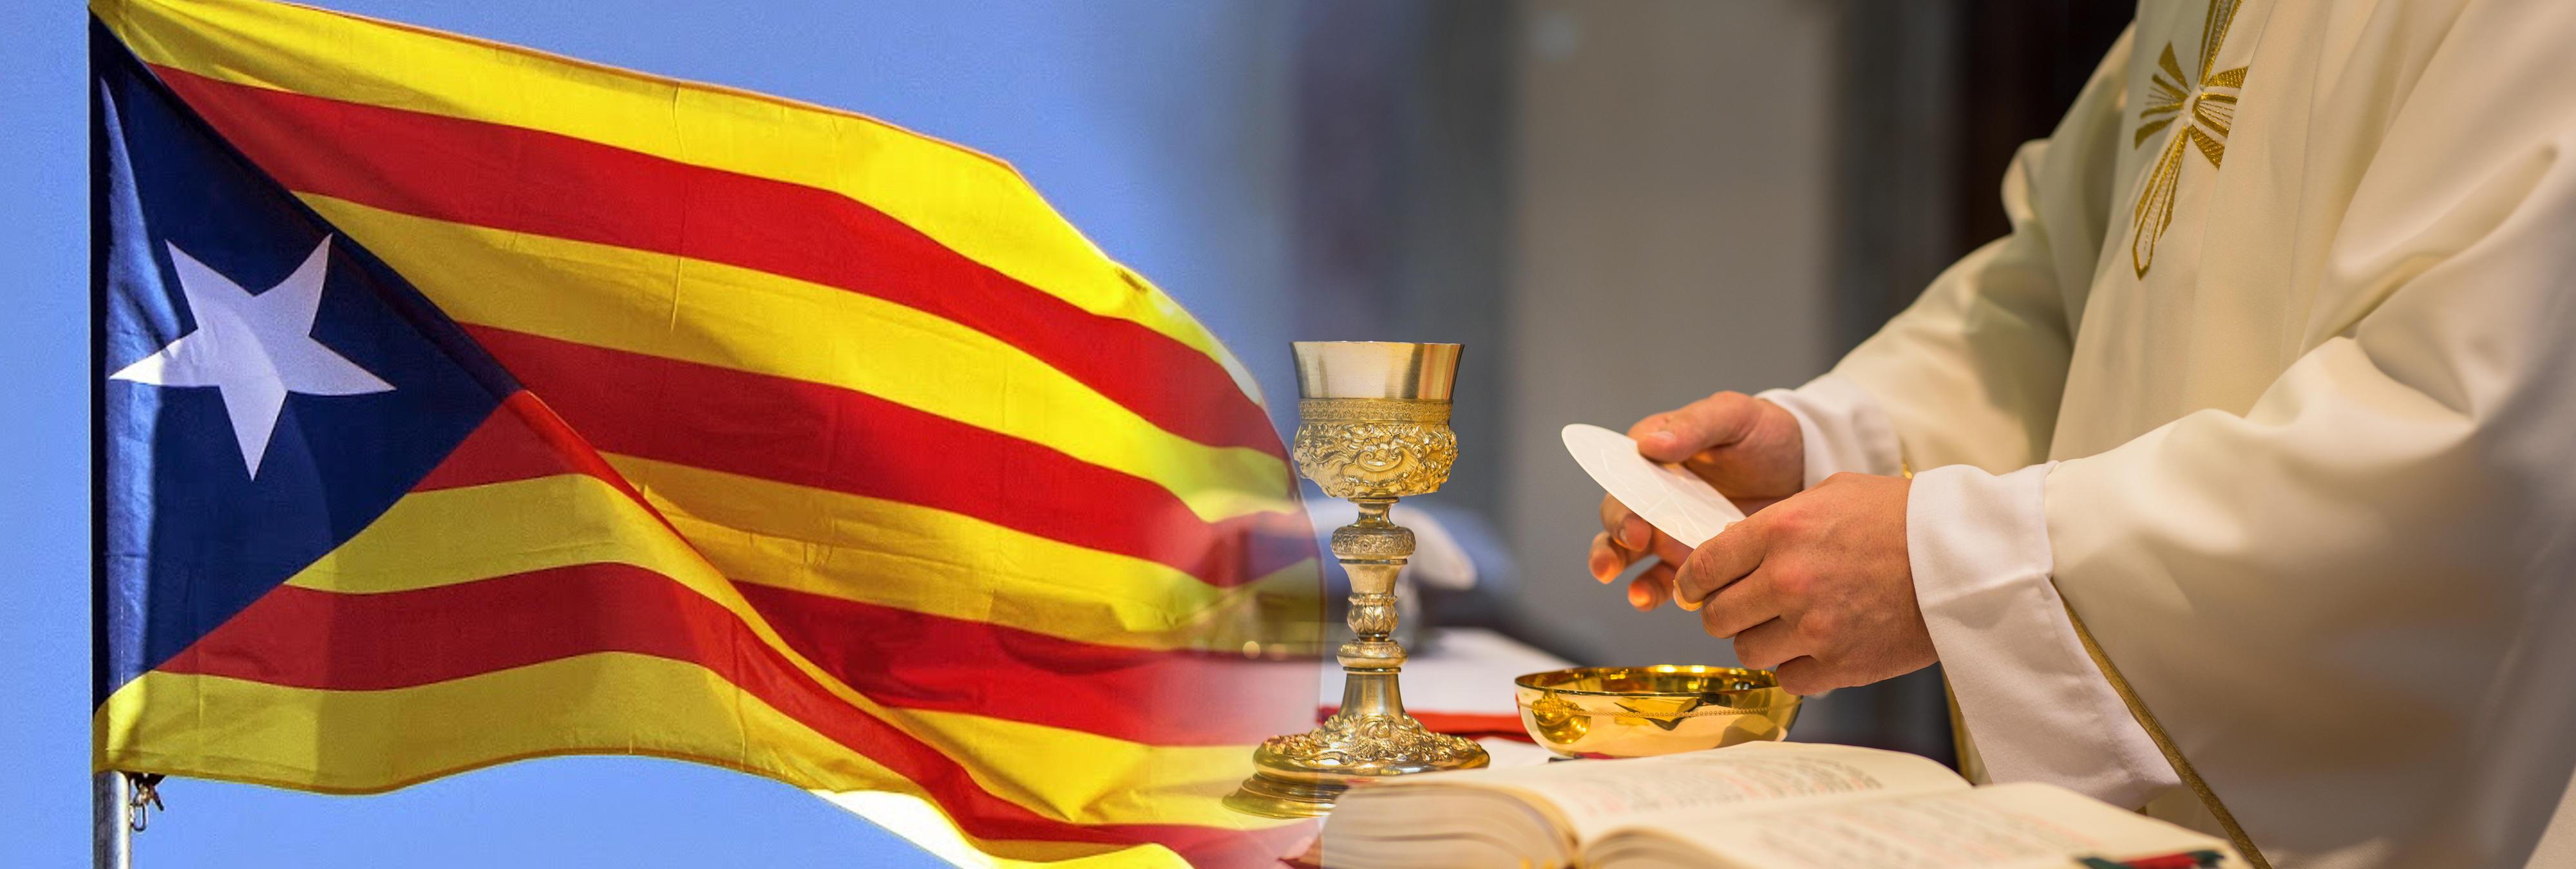 La Iglesia se manifiesta en Cataluña: quieren Referéndum e independencia